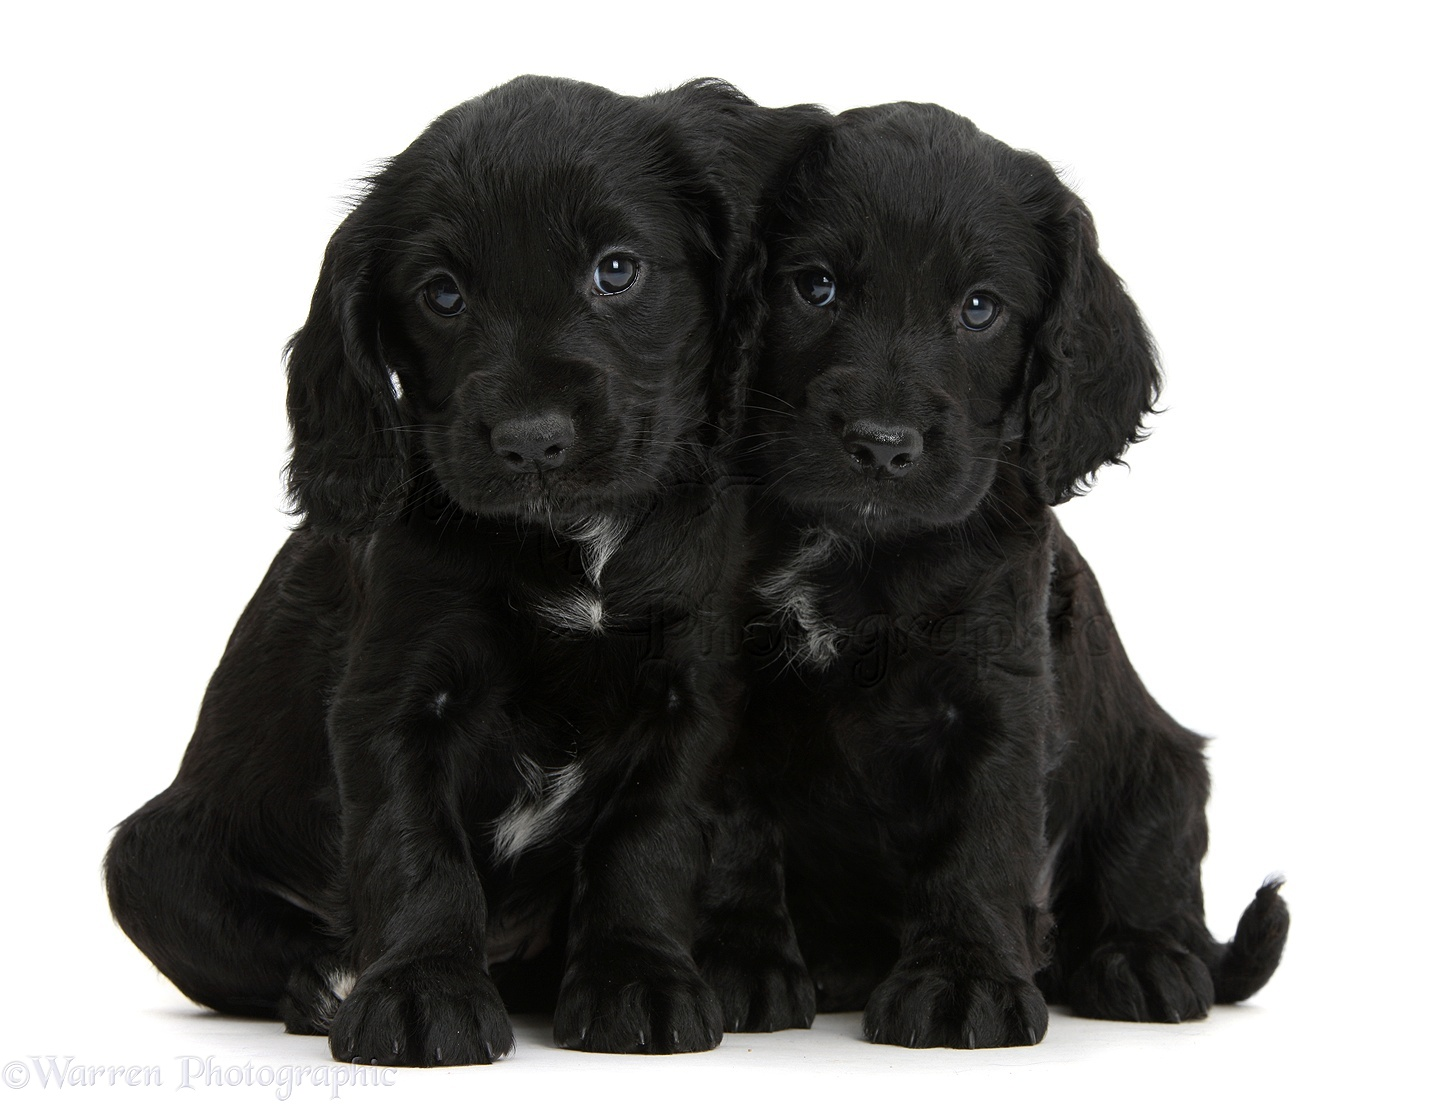 Dog Breeds Beginning With C